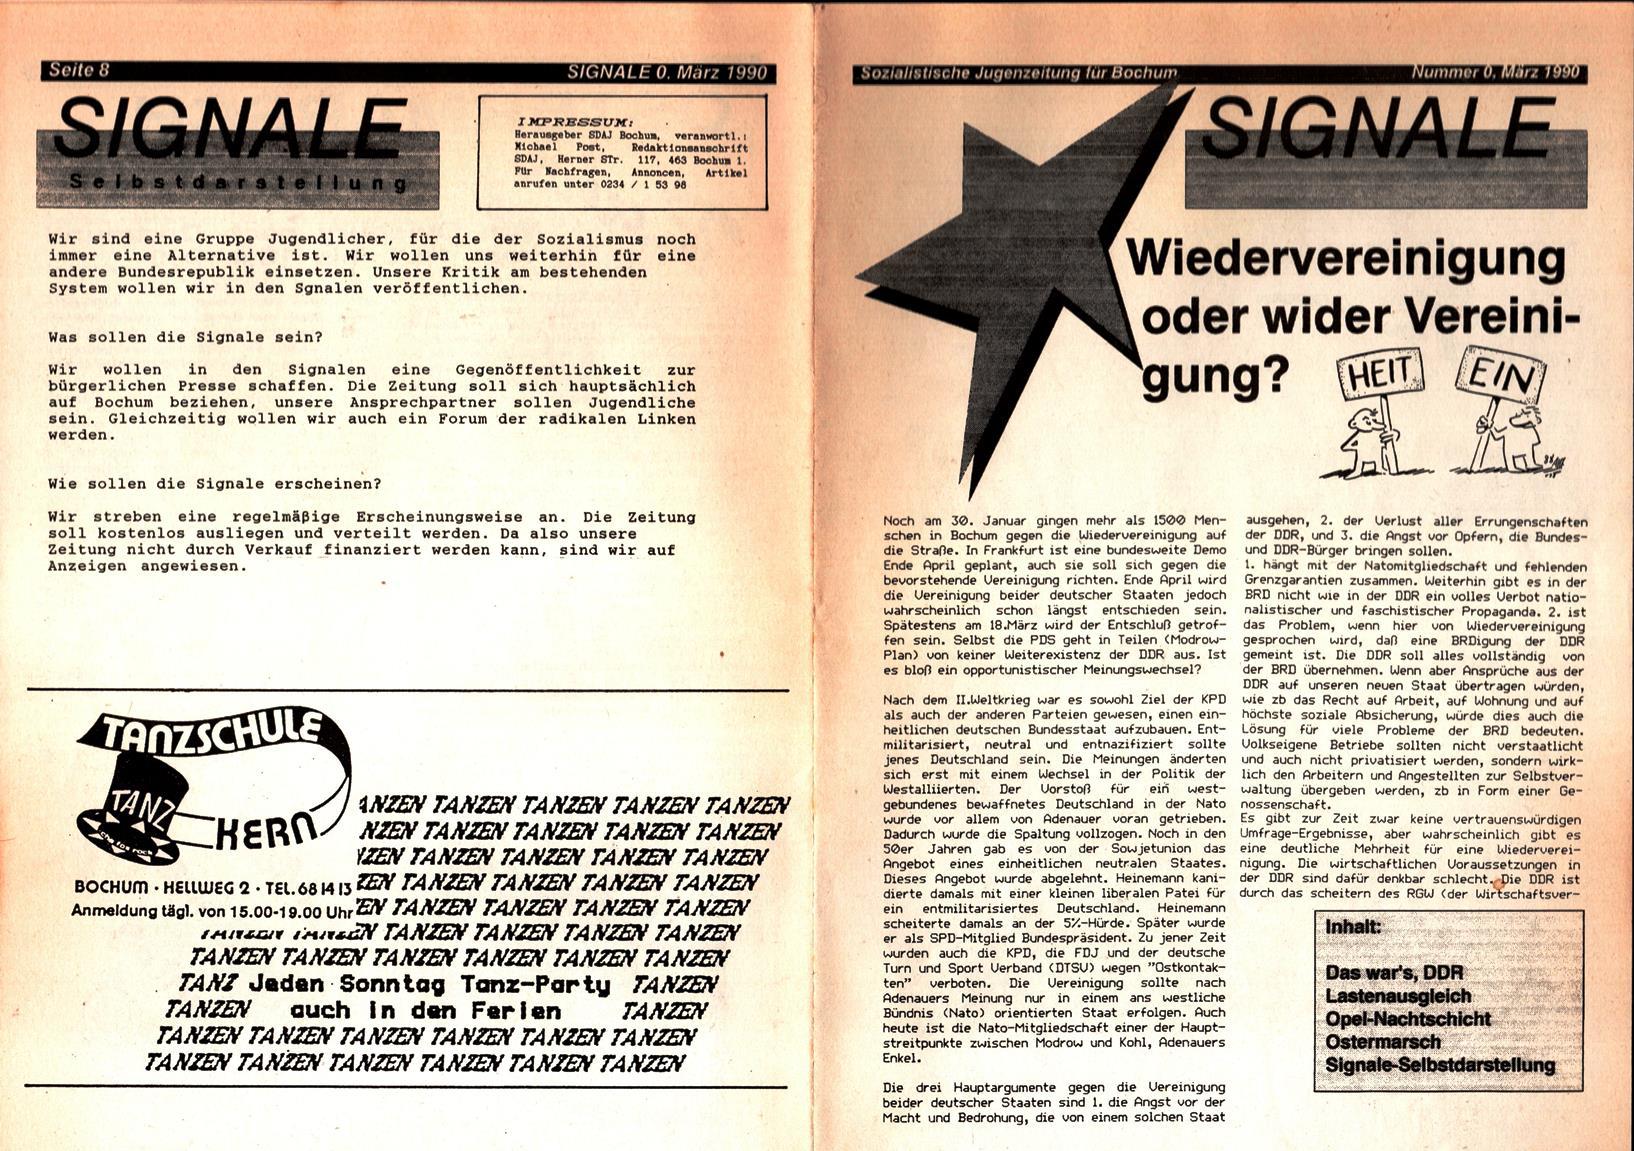 Bochum_SDAJ_Signale_19900300_001